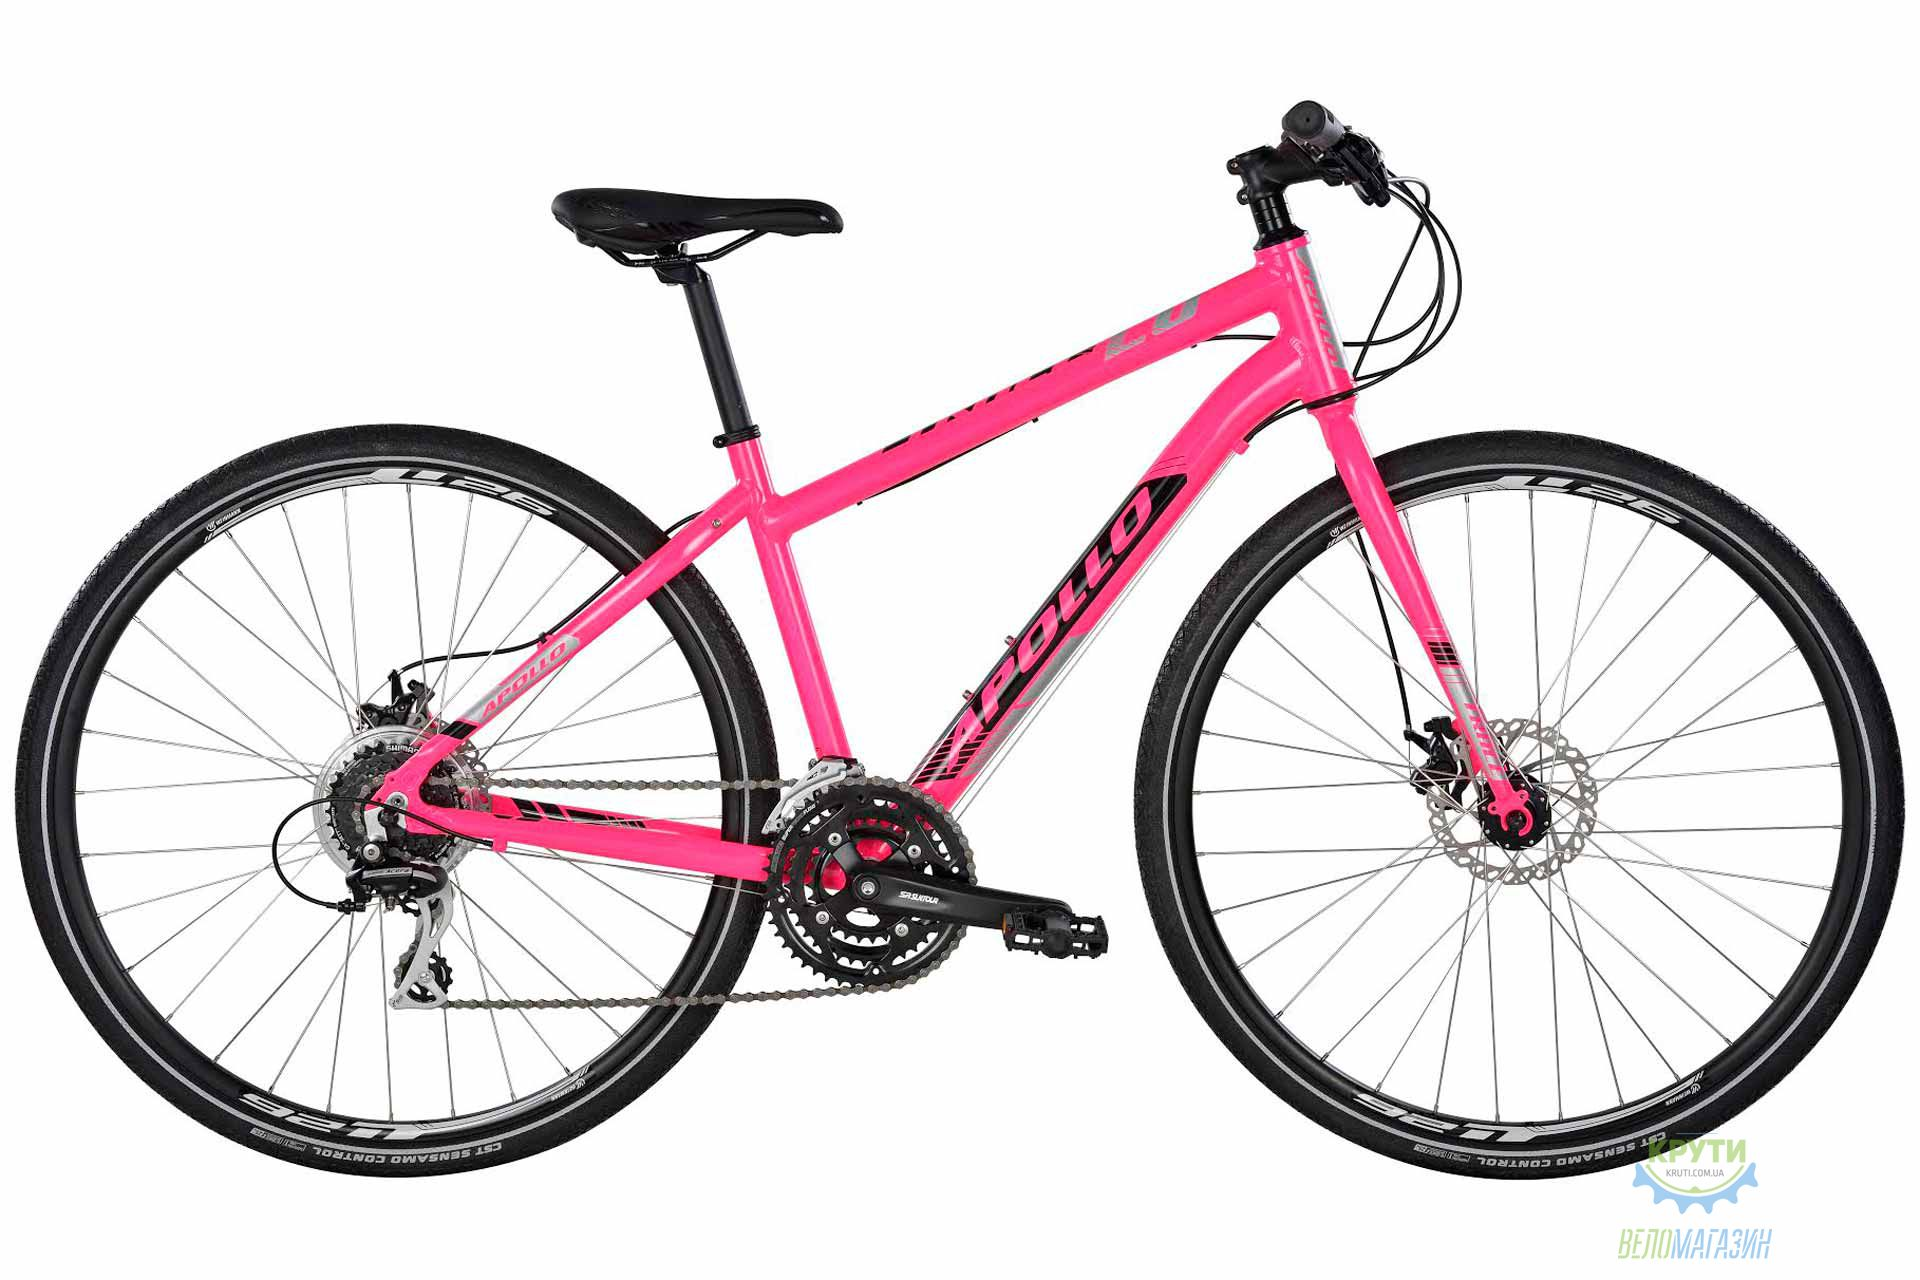 Велосипед 28 Apollo Trace 20 WS HI VIZ рама - M Gloss Pink/Gloss Black/Reflective 2017